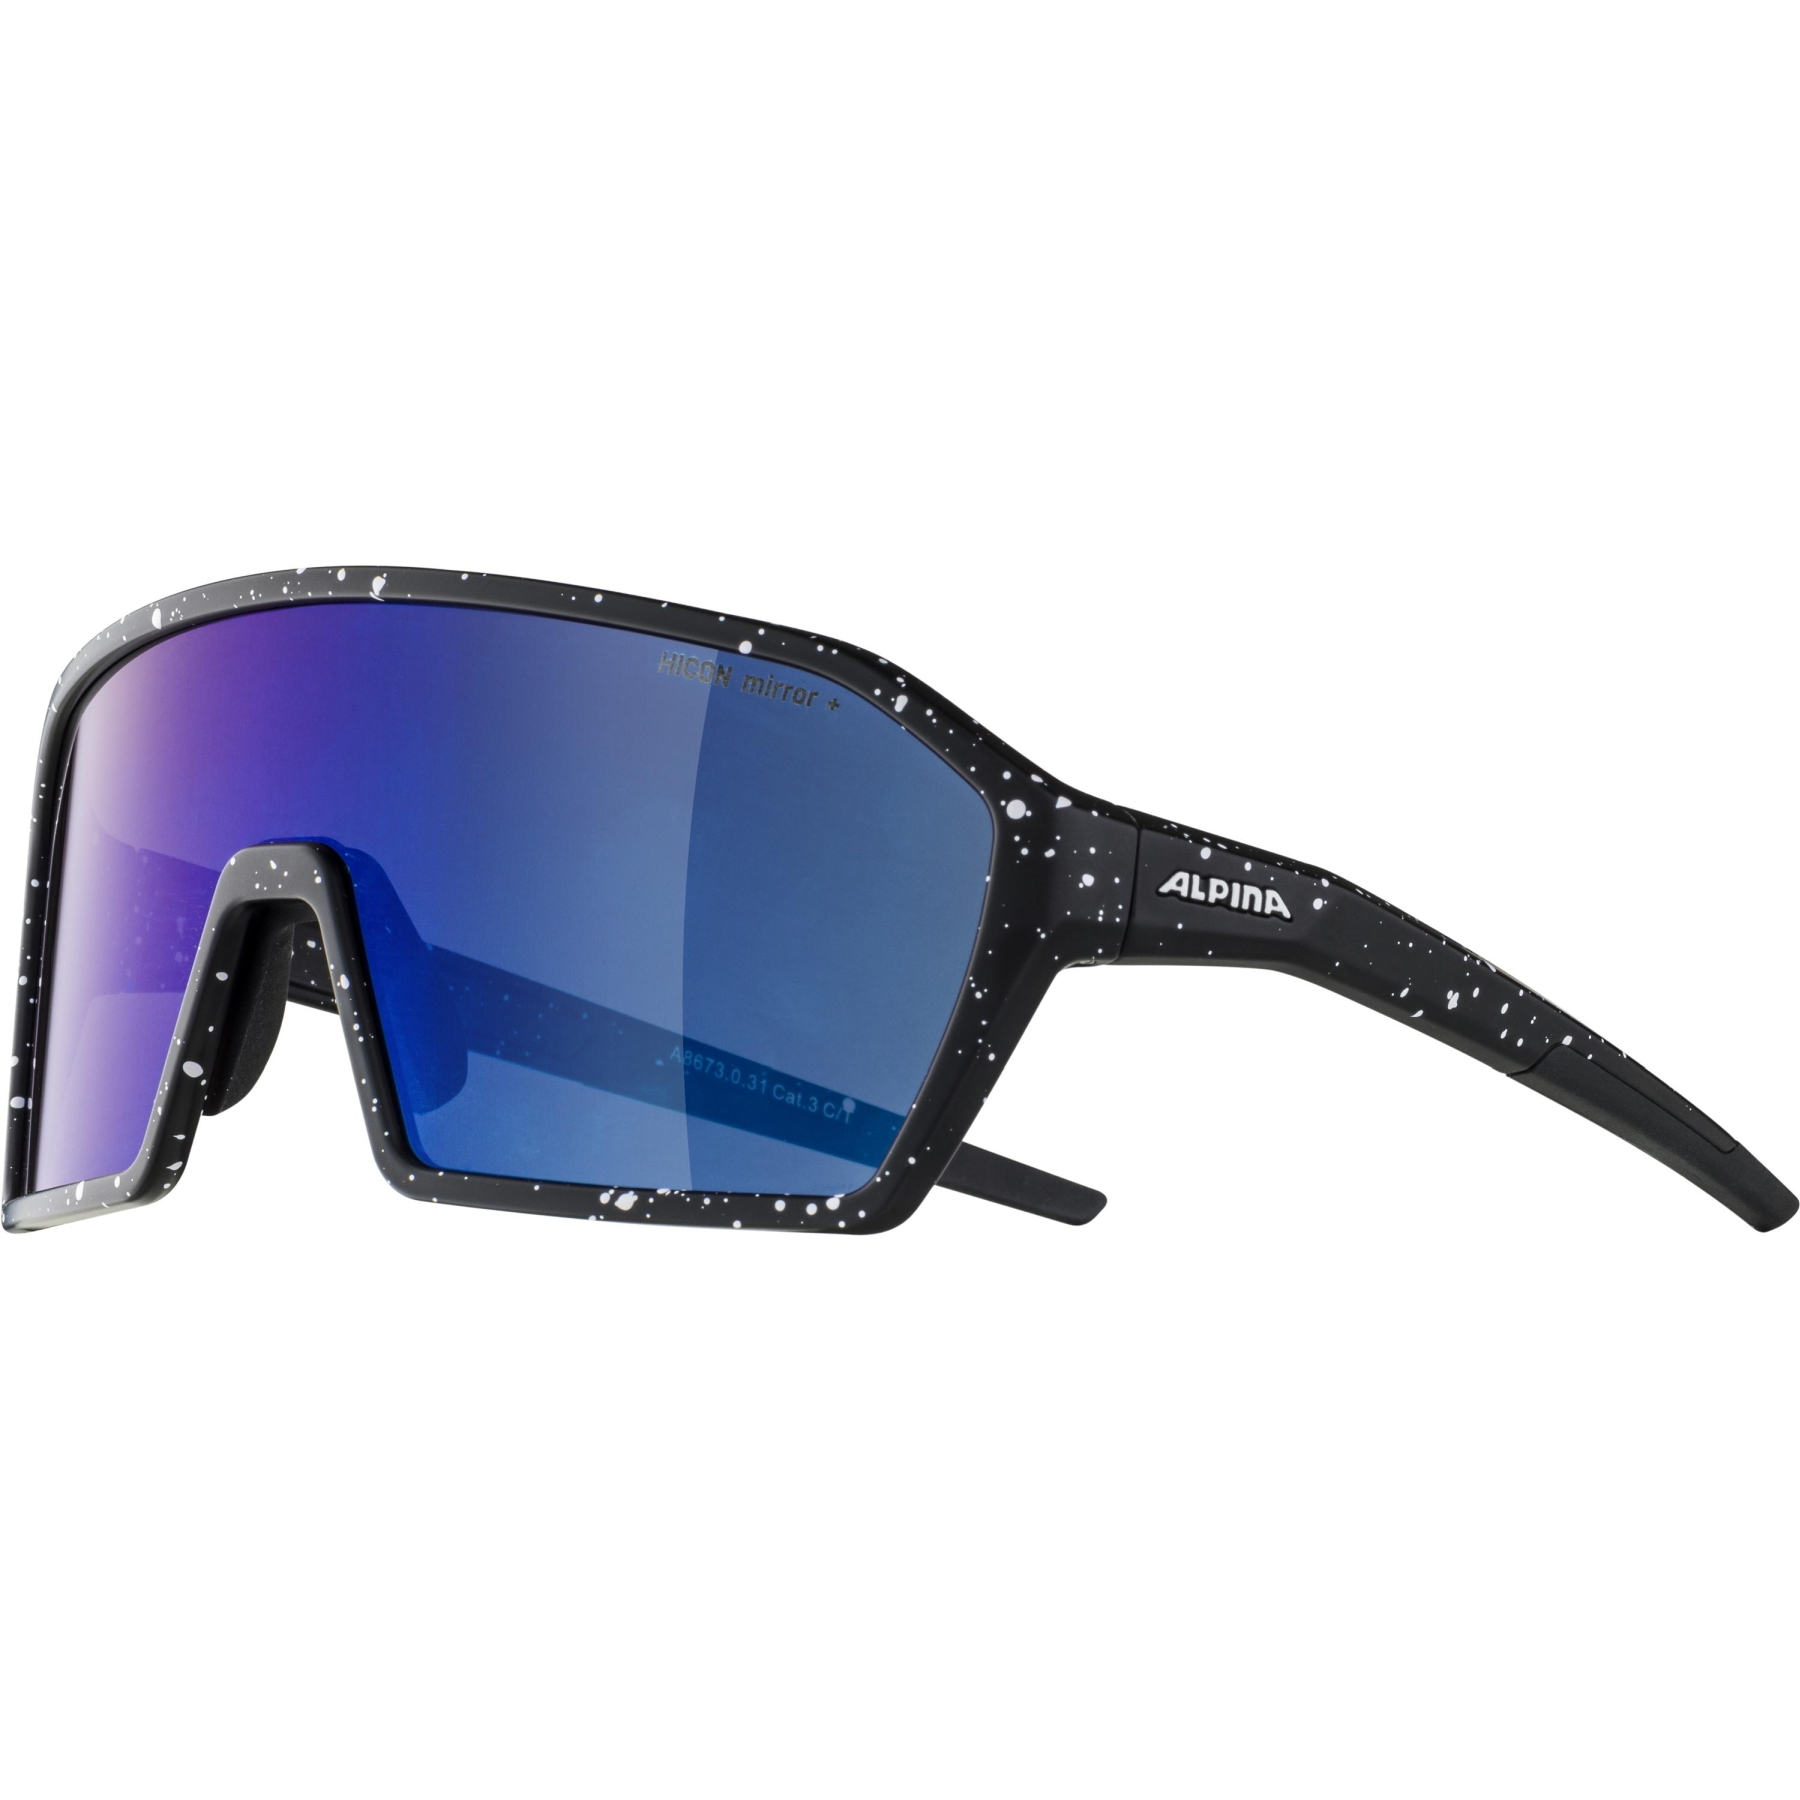 Image of Alpina Ram HM+ Glasses - black blur matt / Hicon blue mirror